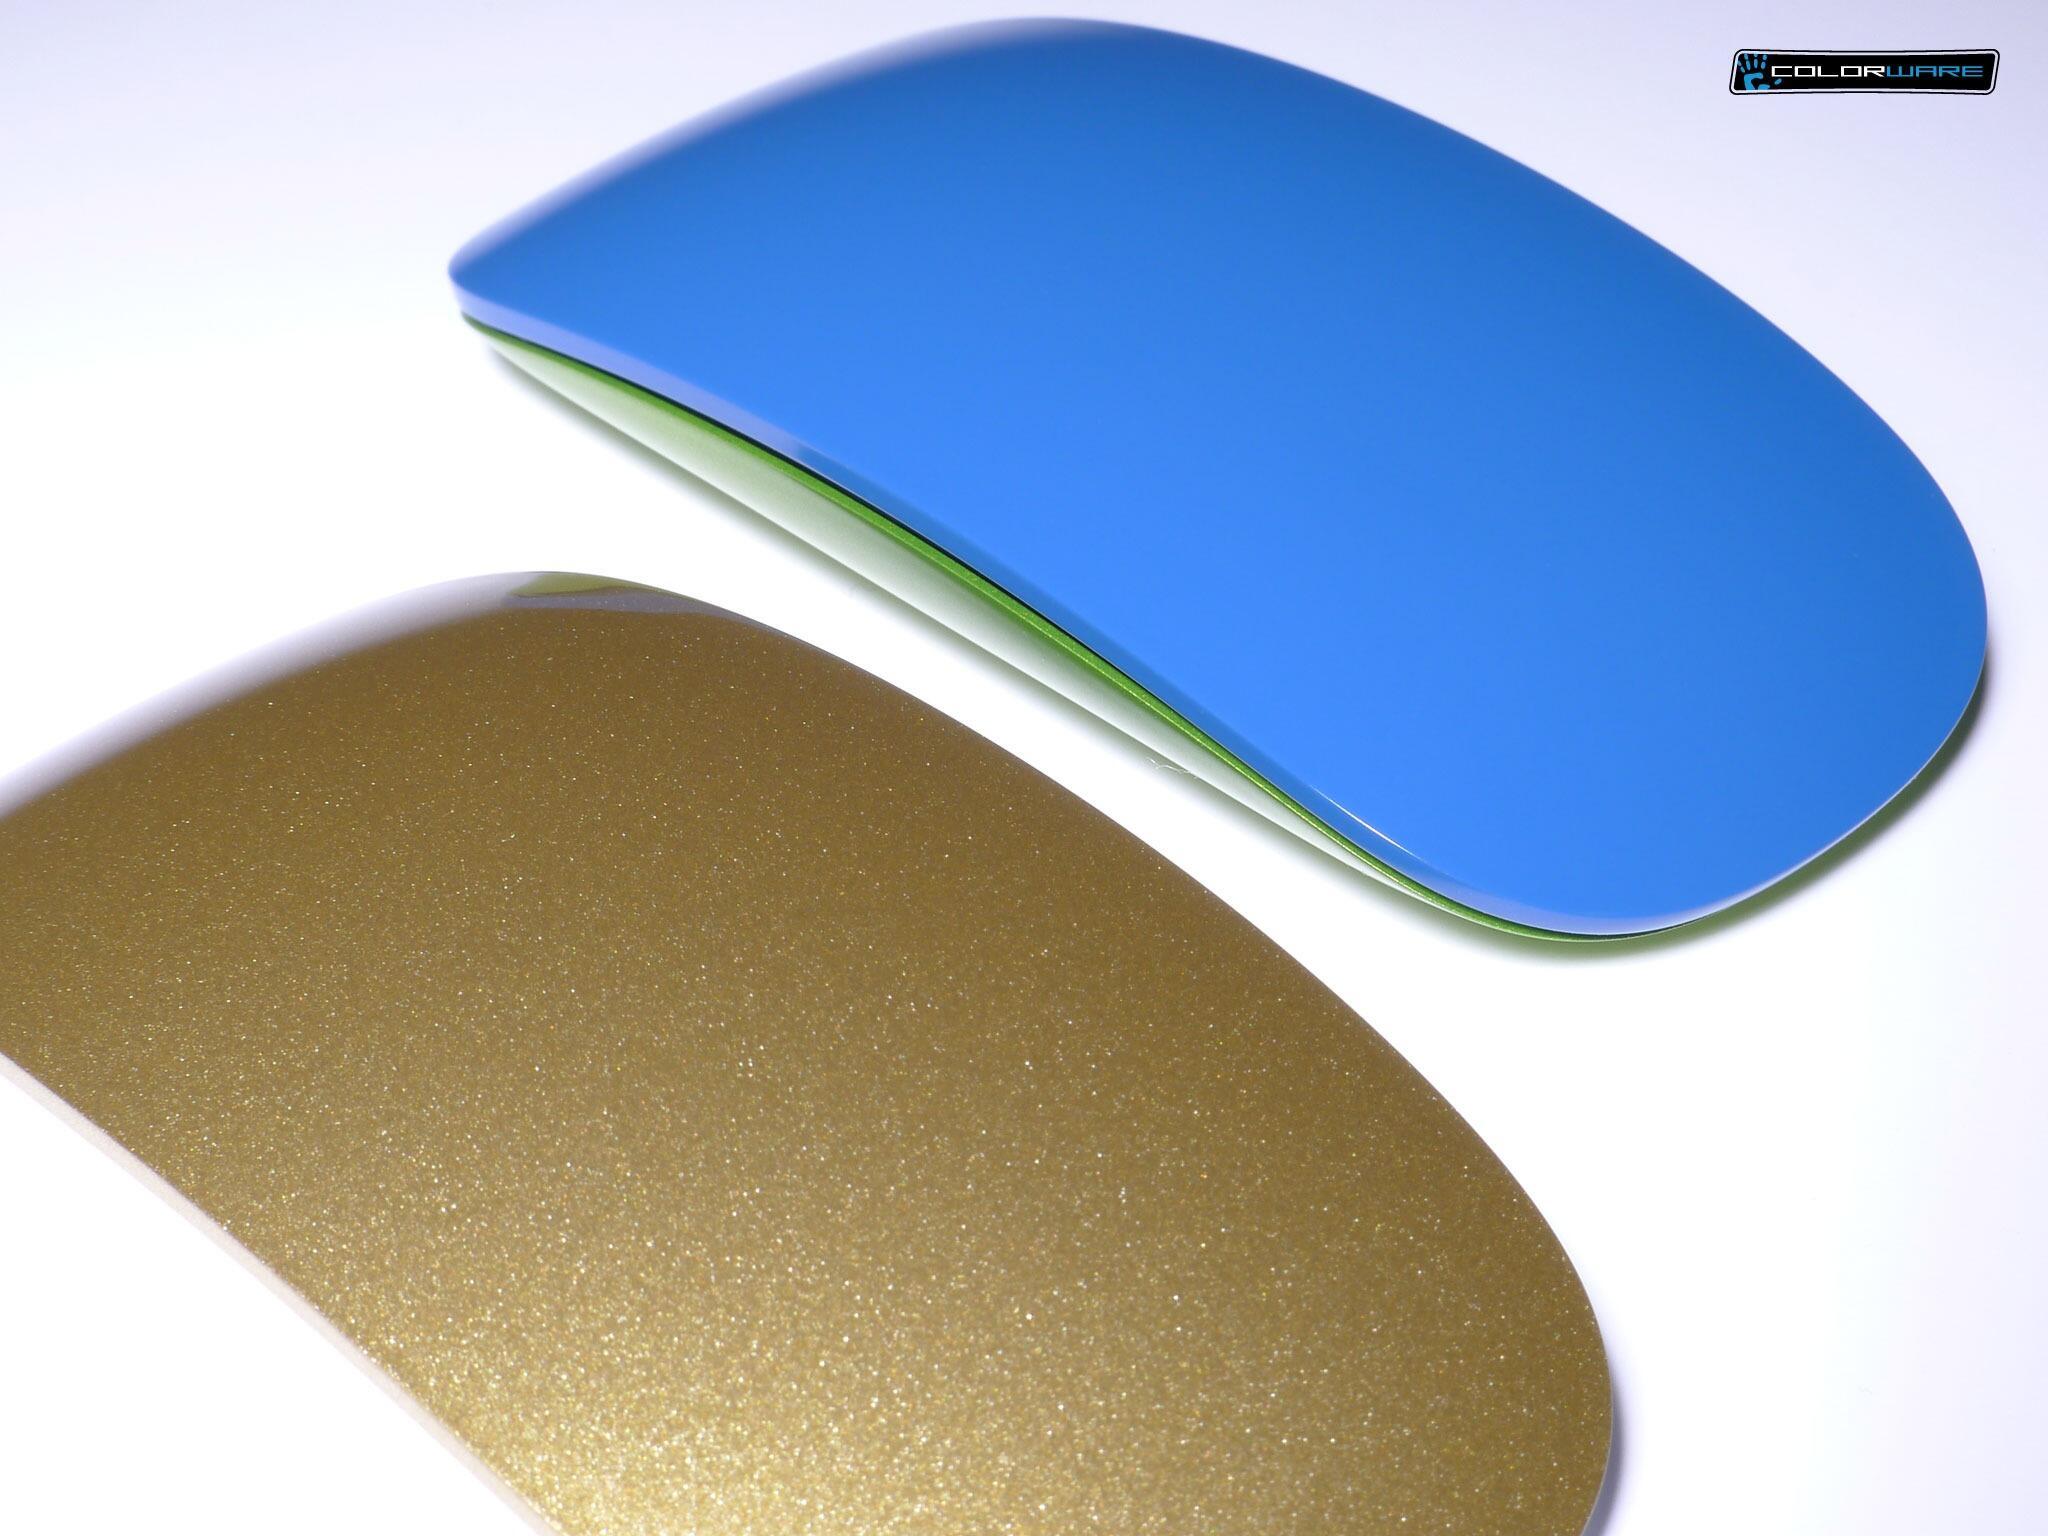 Metallic vs Solid? Which do you prefer, Gold Rush or Cobalt? #colorware #custom http://t.co/T4D1hjCVit